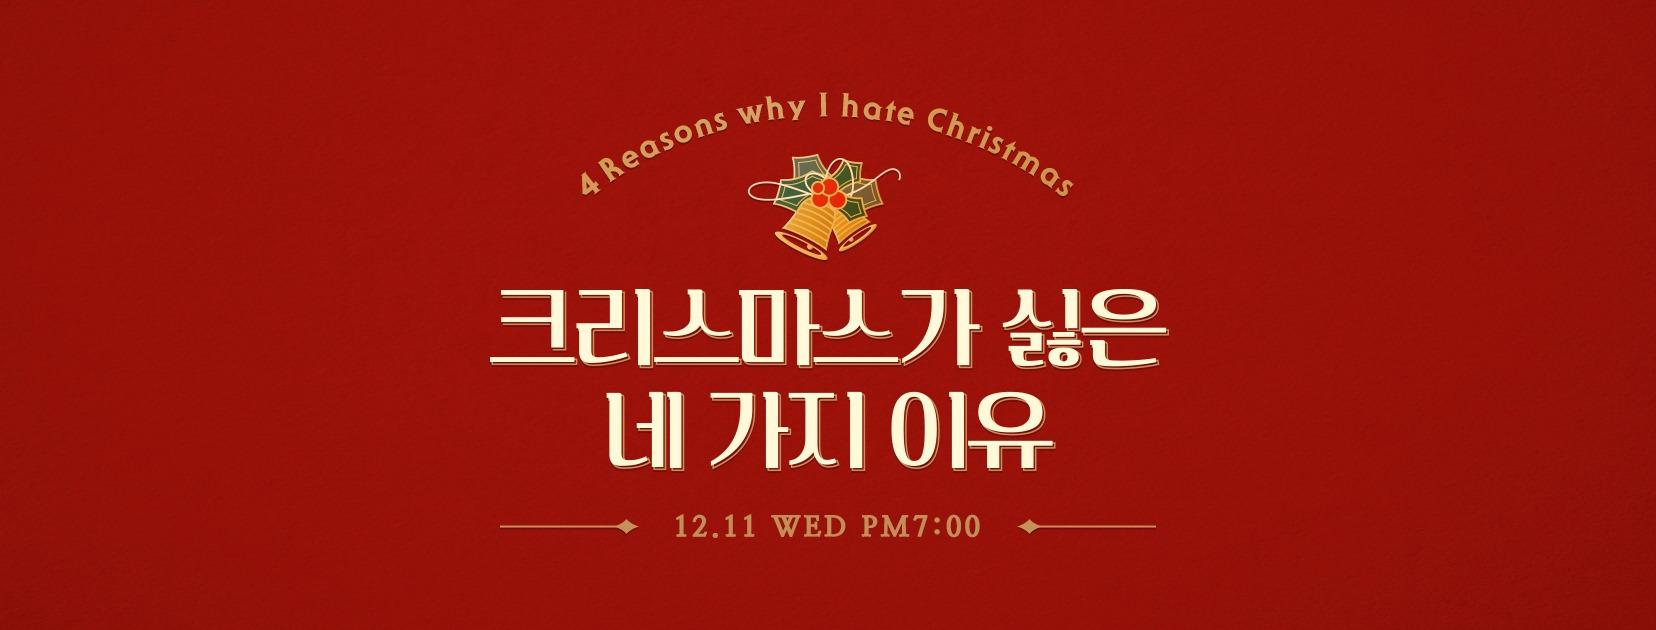 """4 Reasons Why I Hate Christmas"" (2019 Web Drama): Cast & Summary"